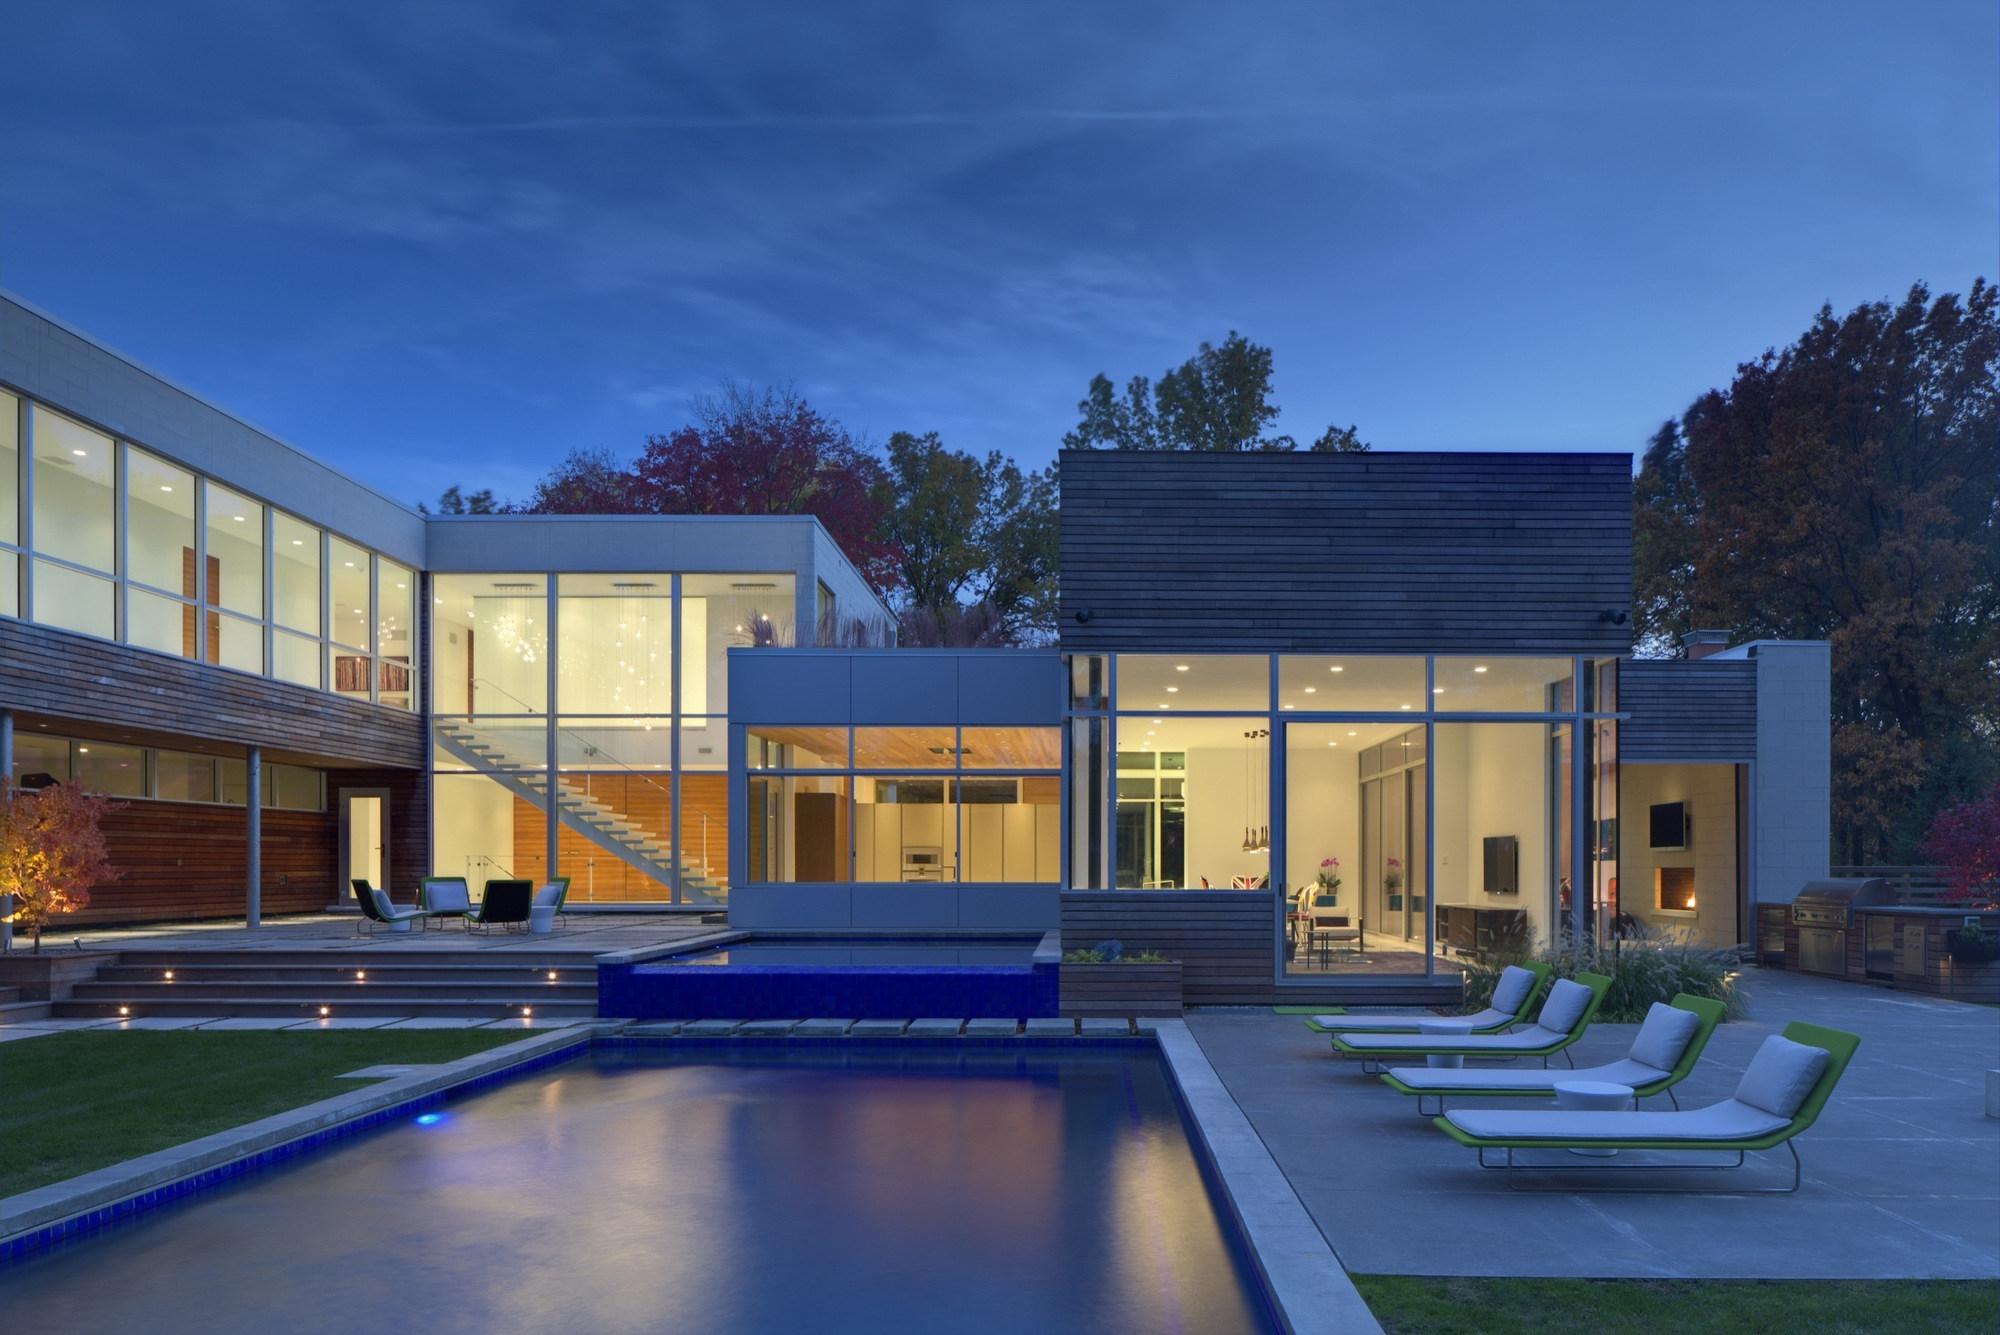 Shaker Heights House by Dimit Architects | KARMATRENDZ